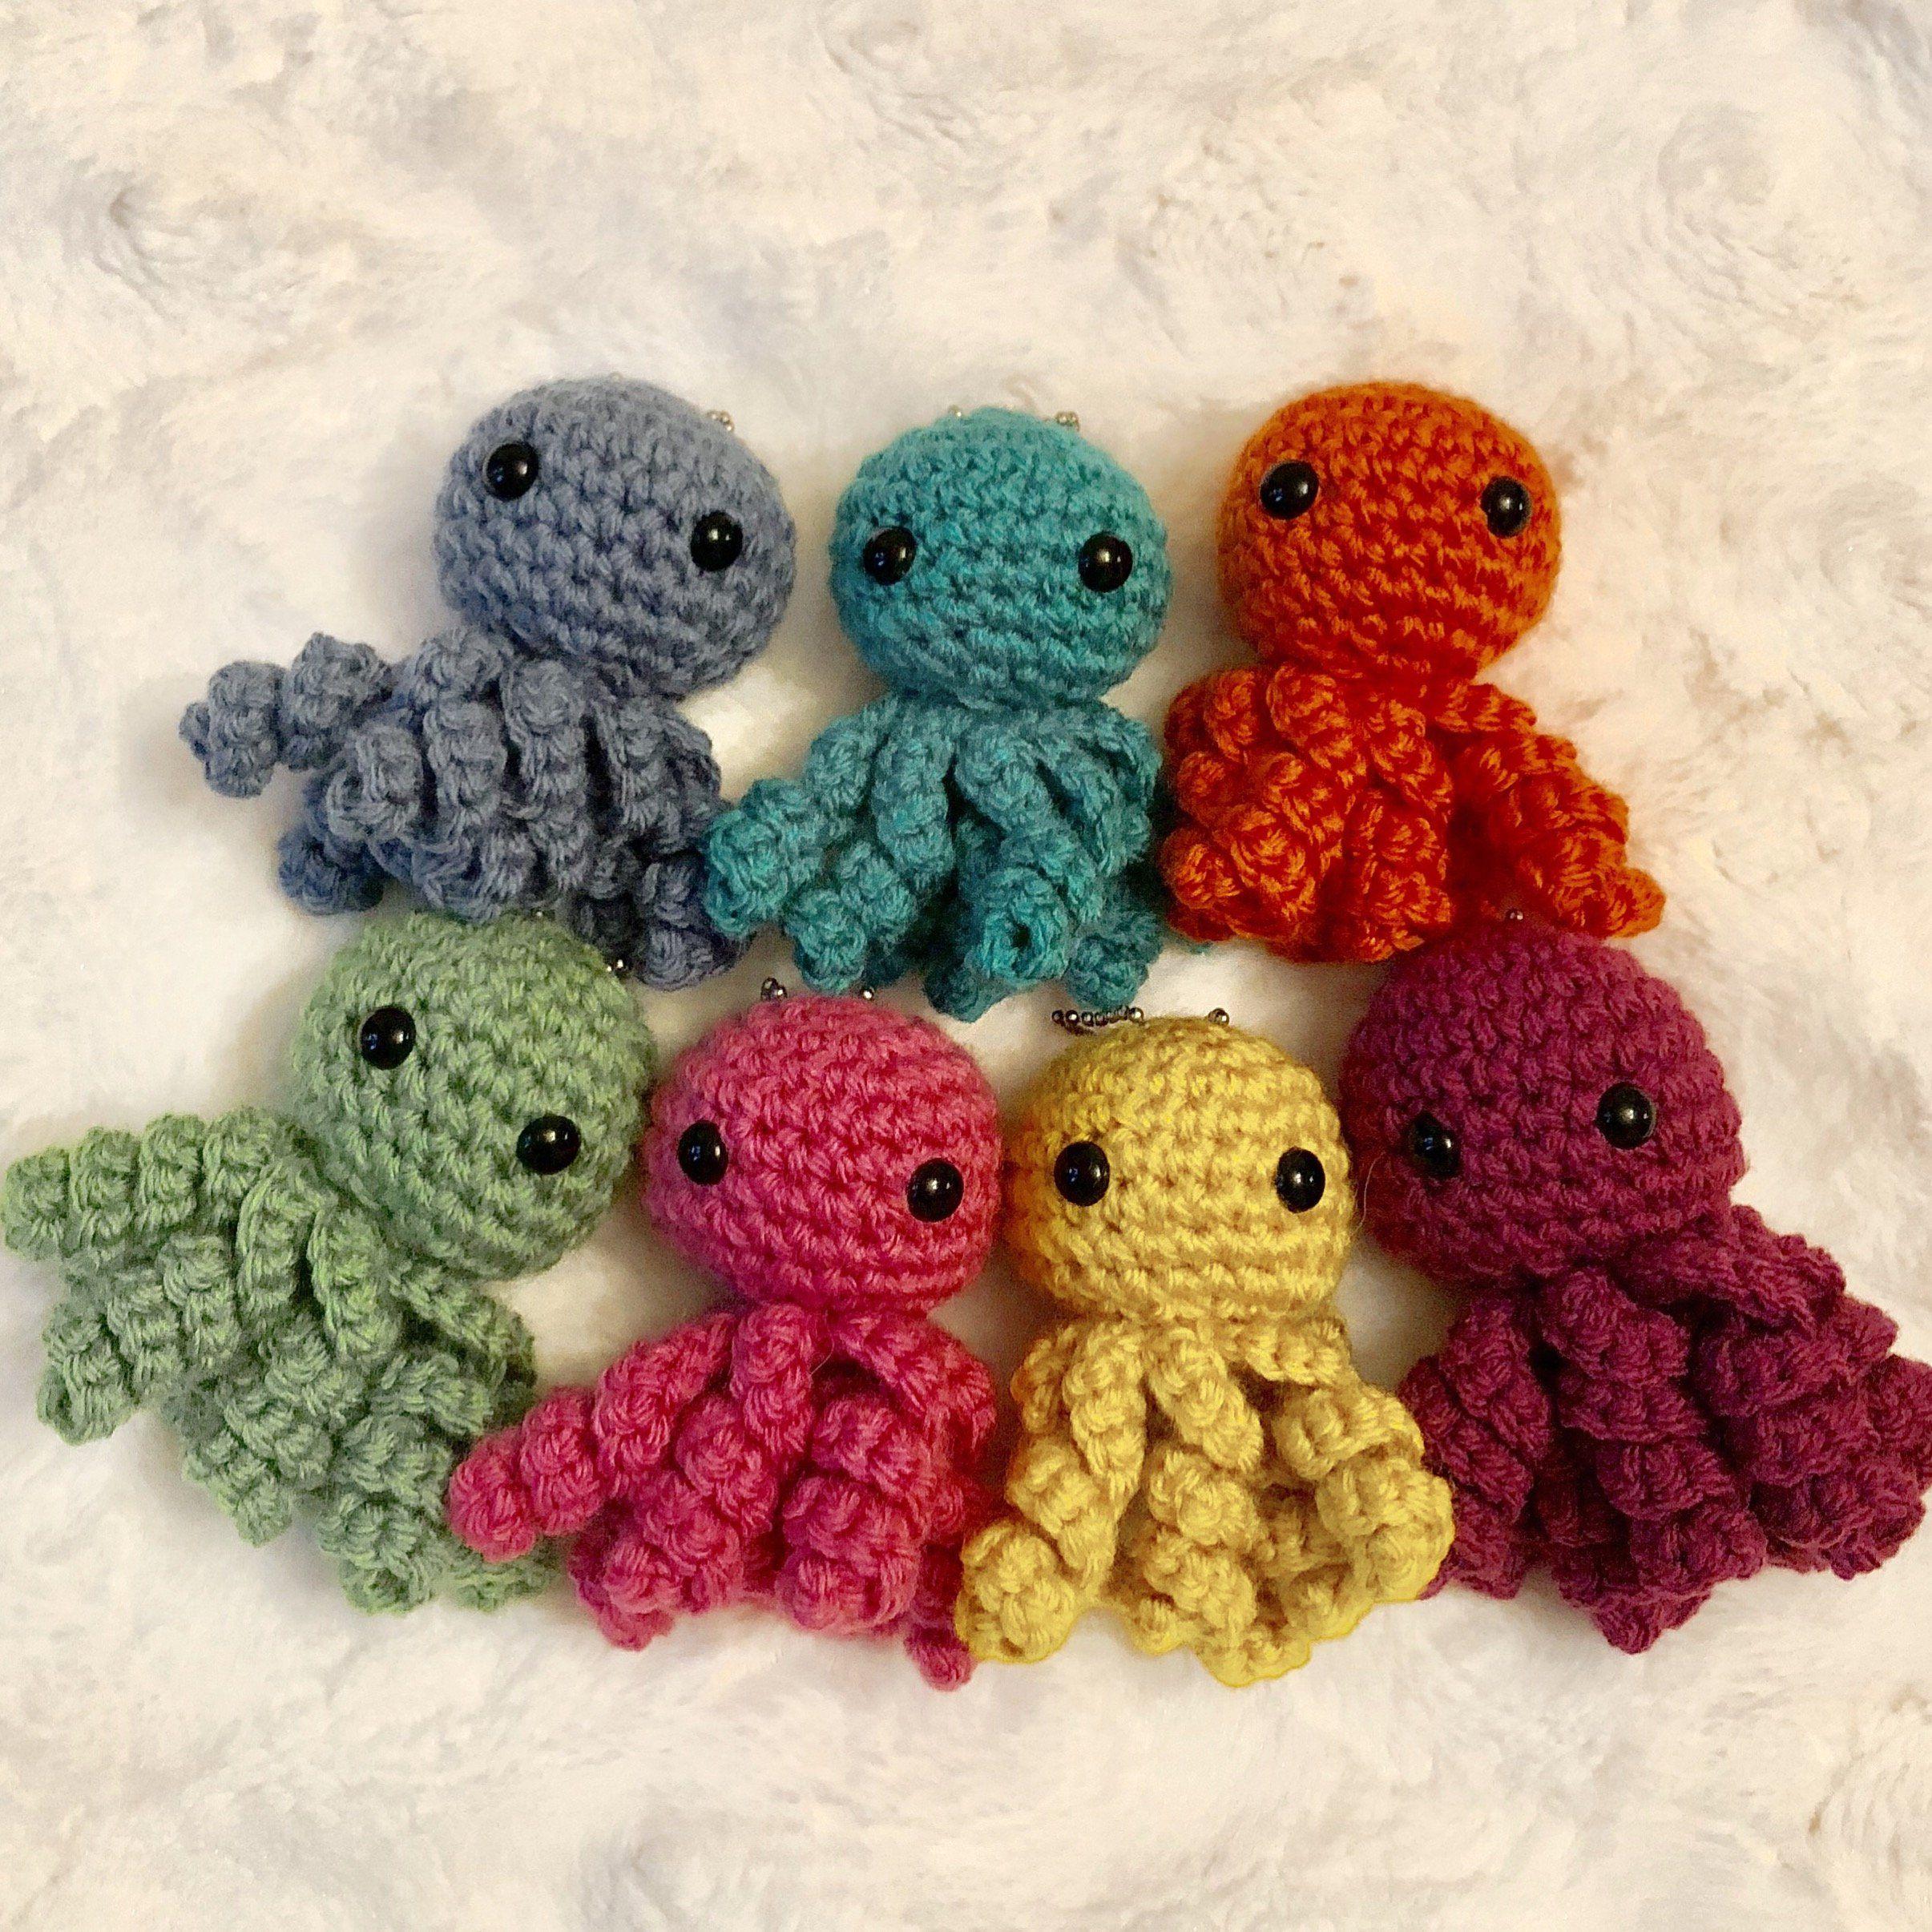 Amigurumi Octopus Crochet Pattern Printable PDF | Amigurumi ... | 2411x2411